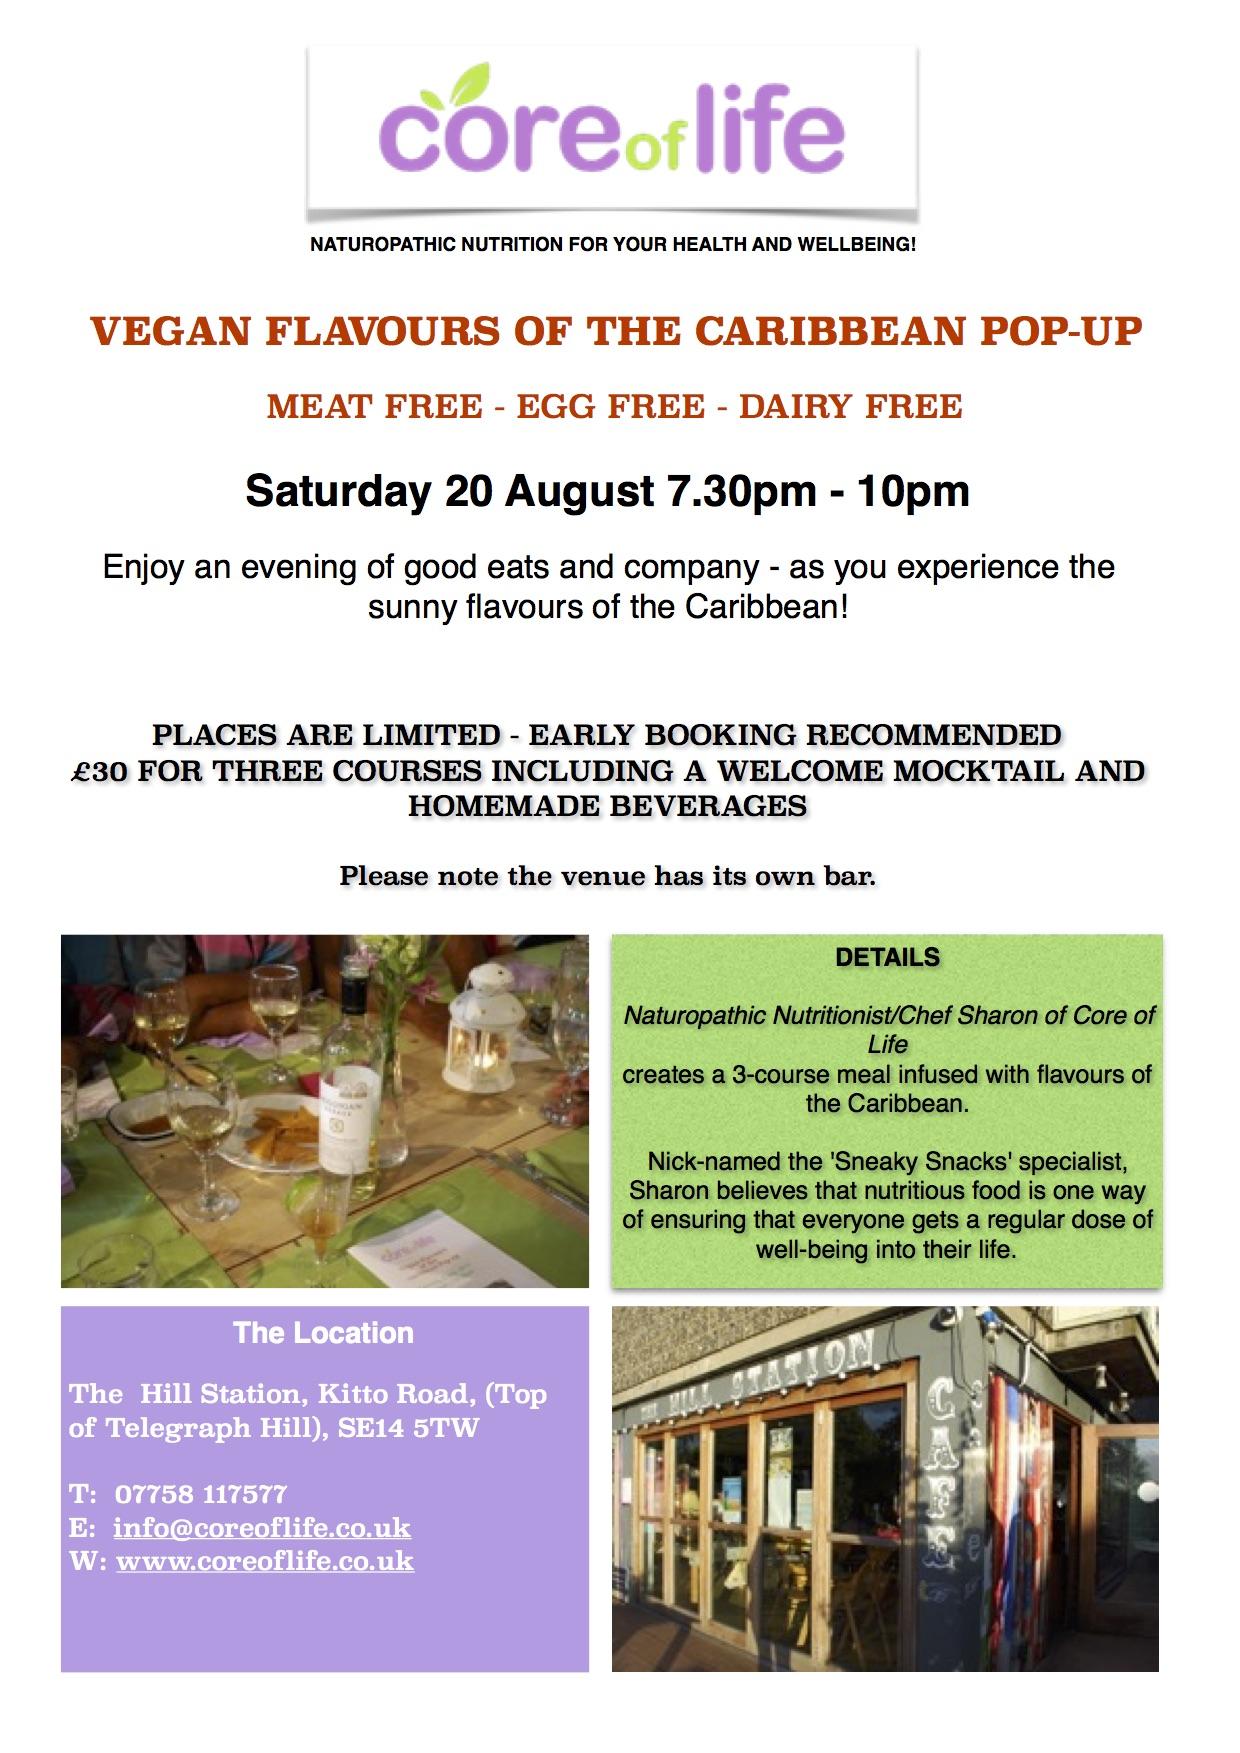 Vegan Flavours of the Caribbean Lewisham Card